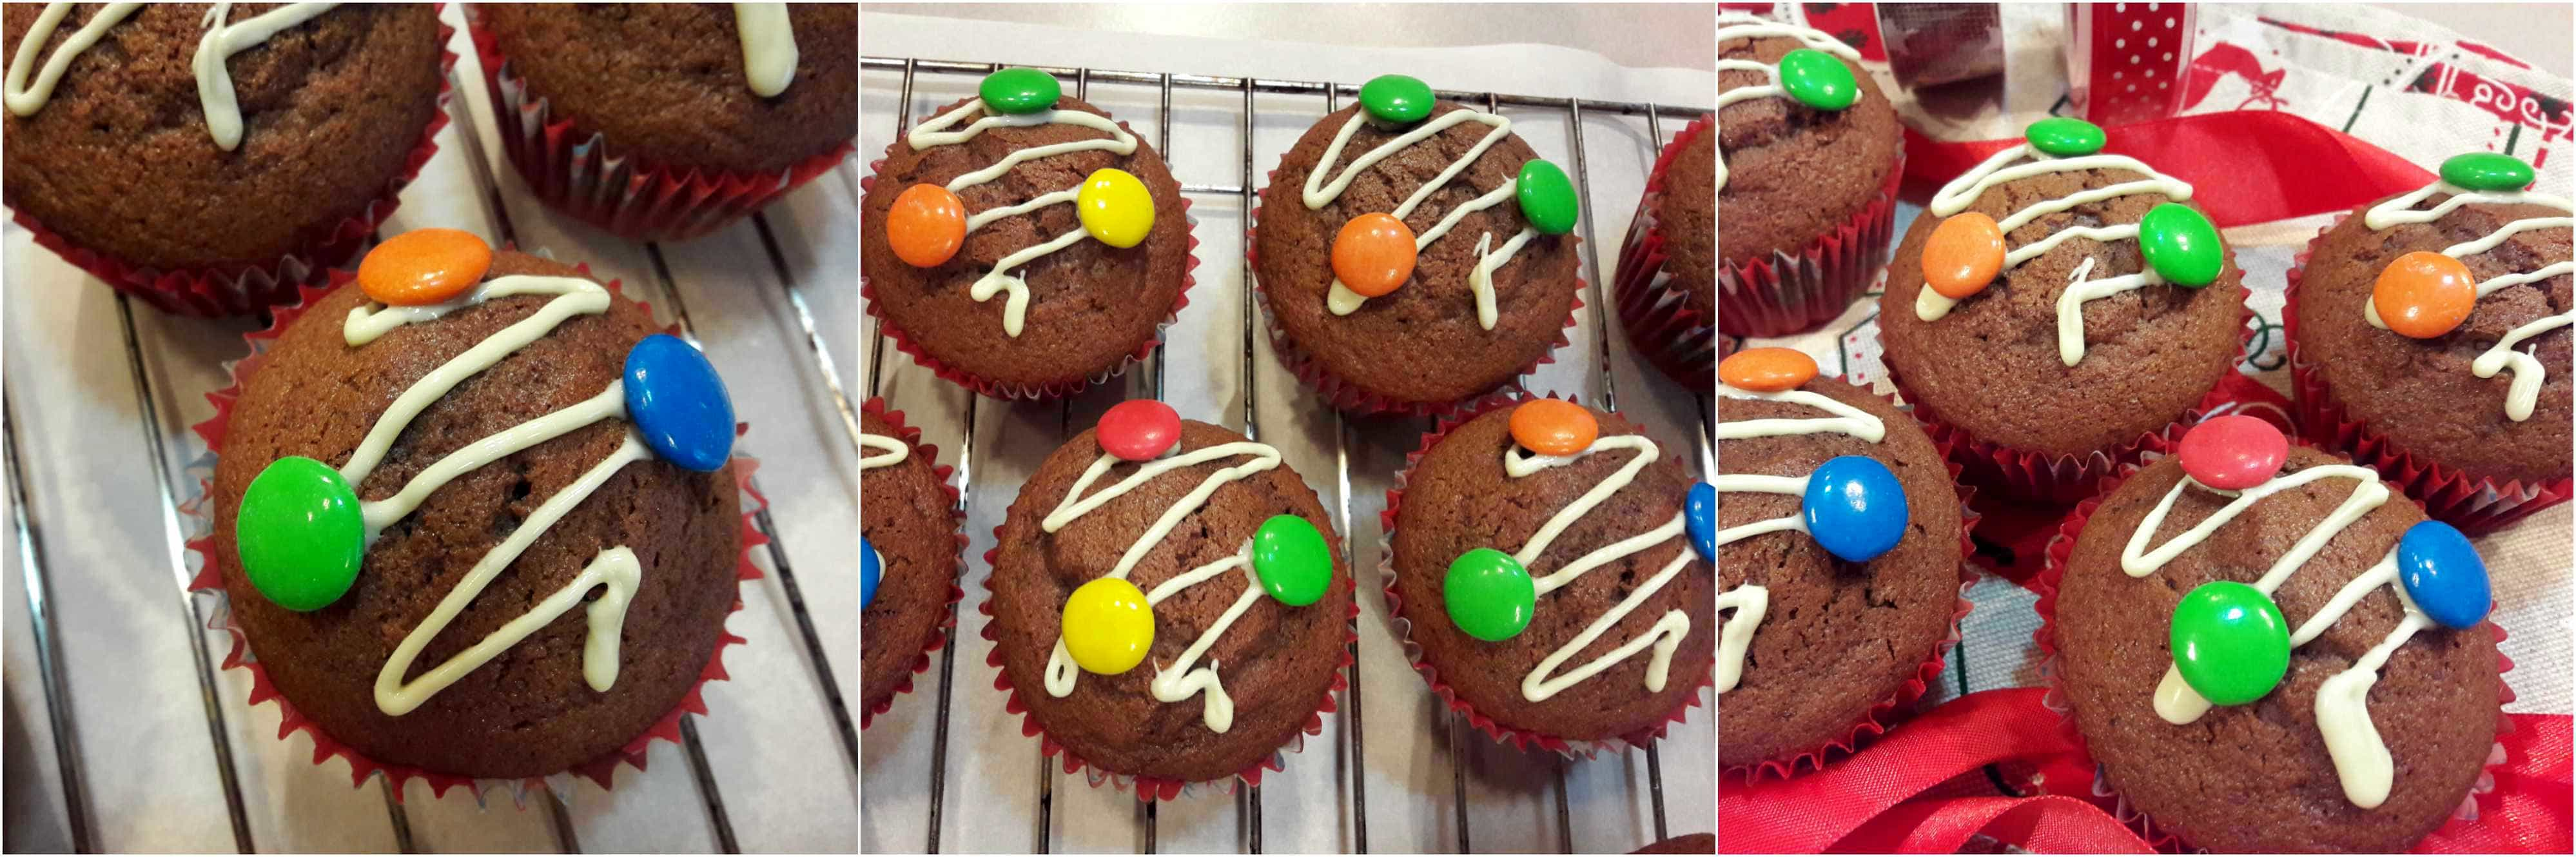 Muffin Natale box2@VG-2